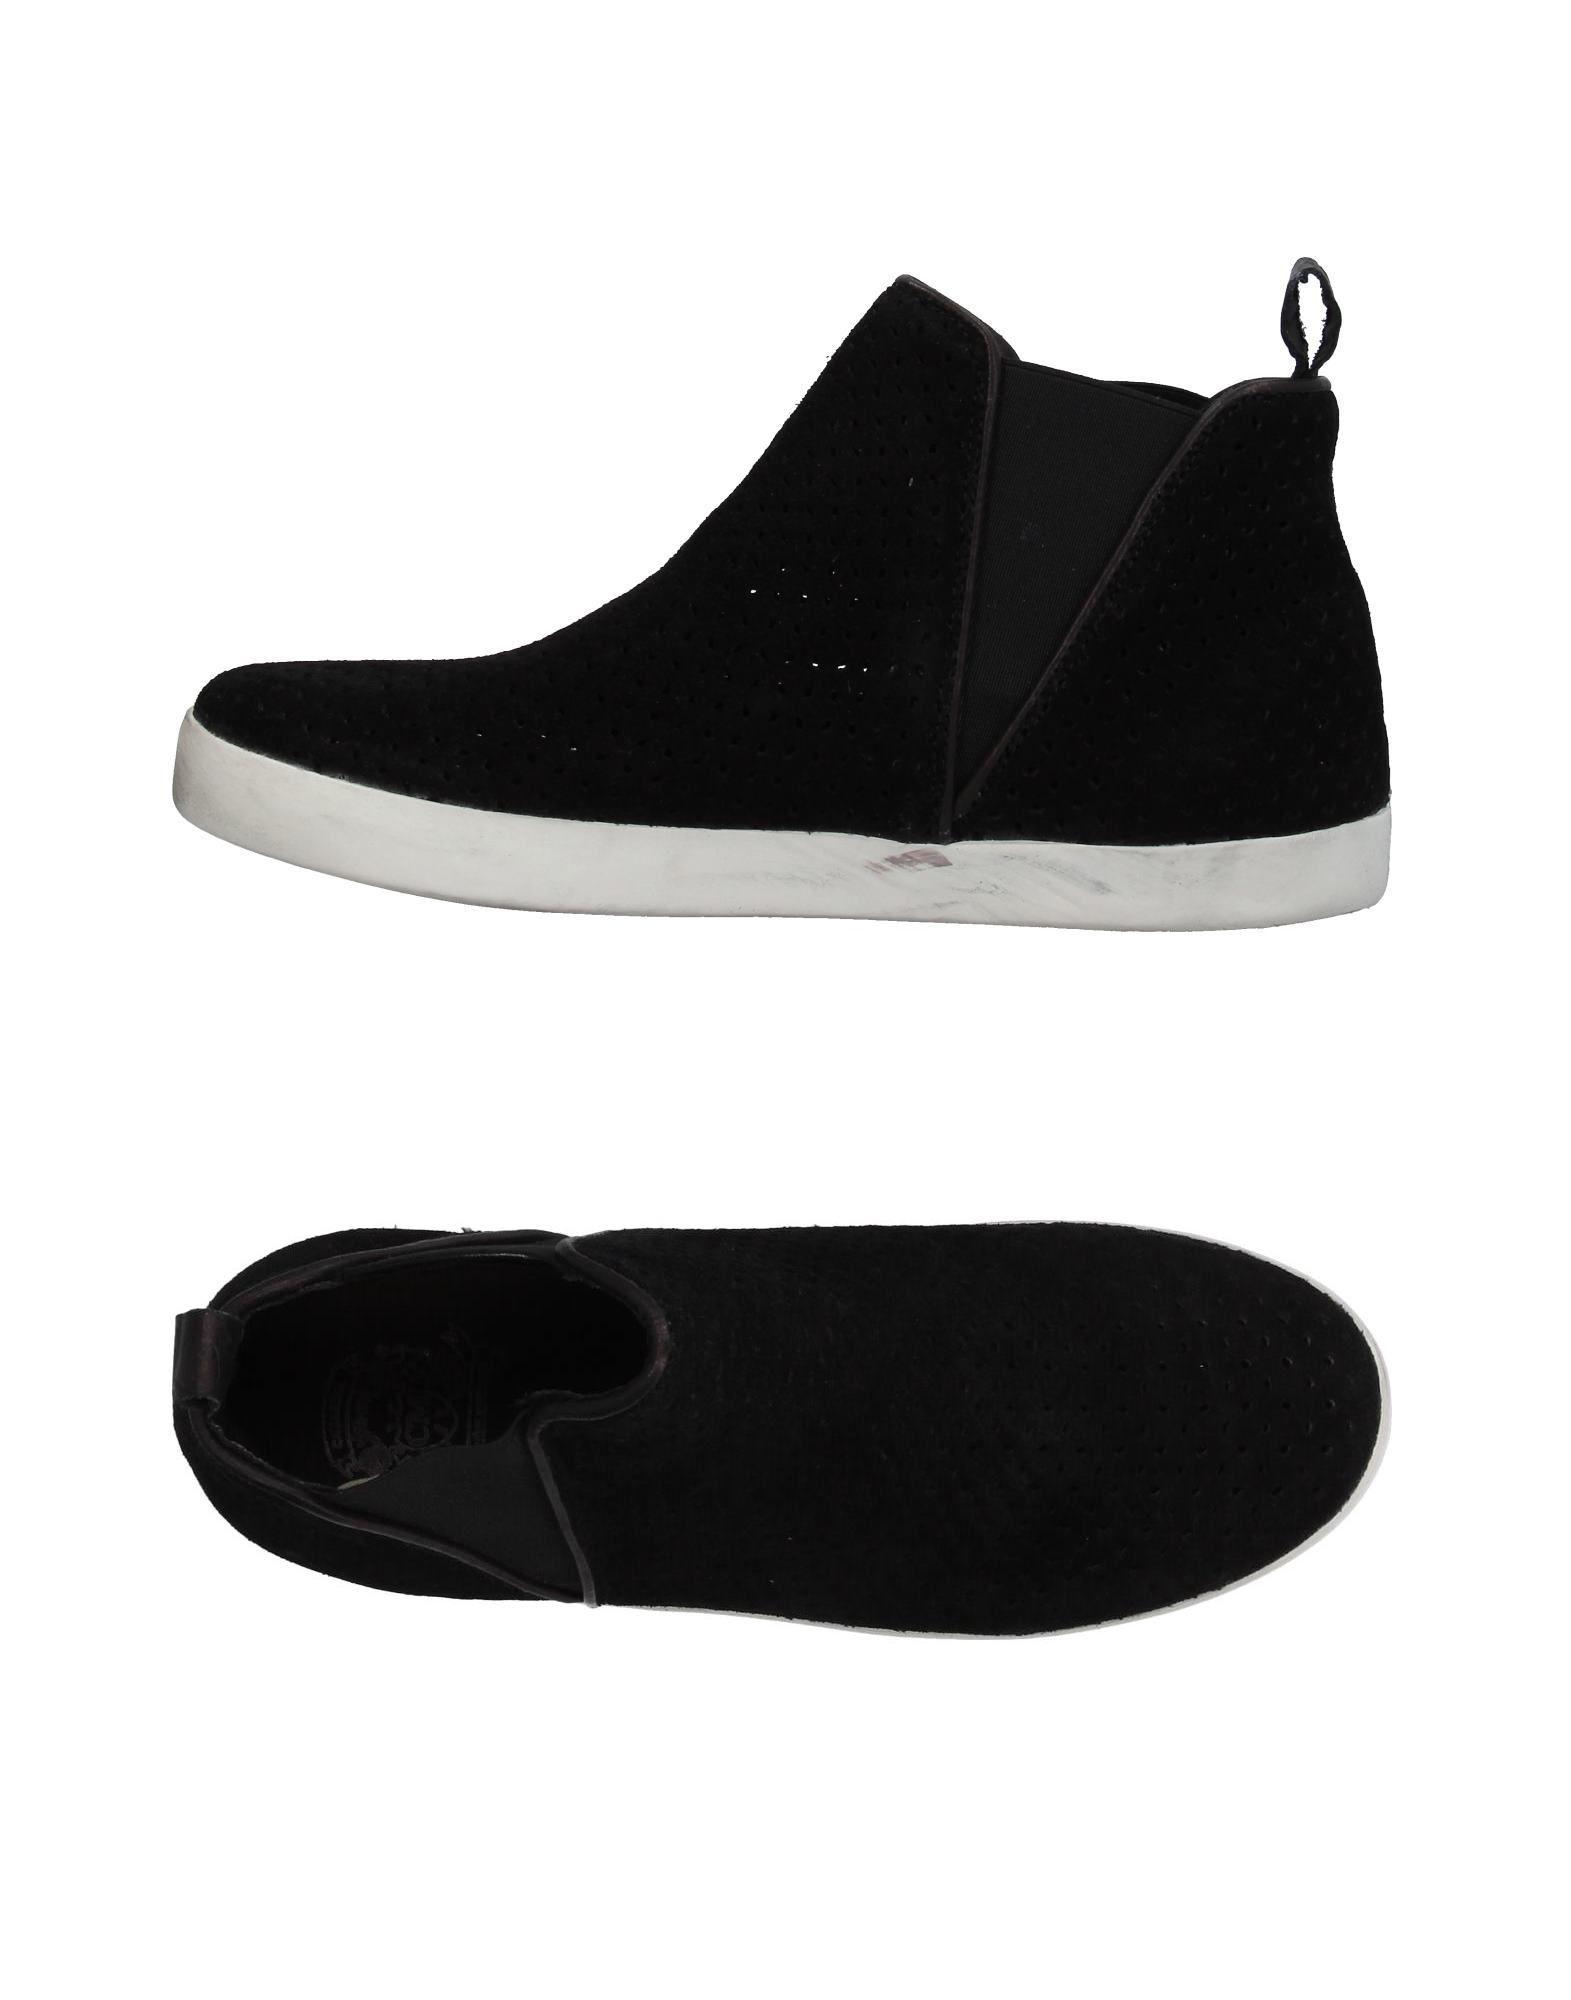 Sneakers Catarina Martins Martins Catarina Donna - 11206776HE 4e18fc